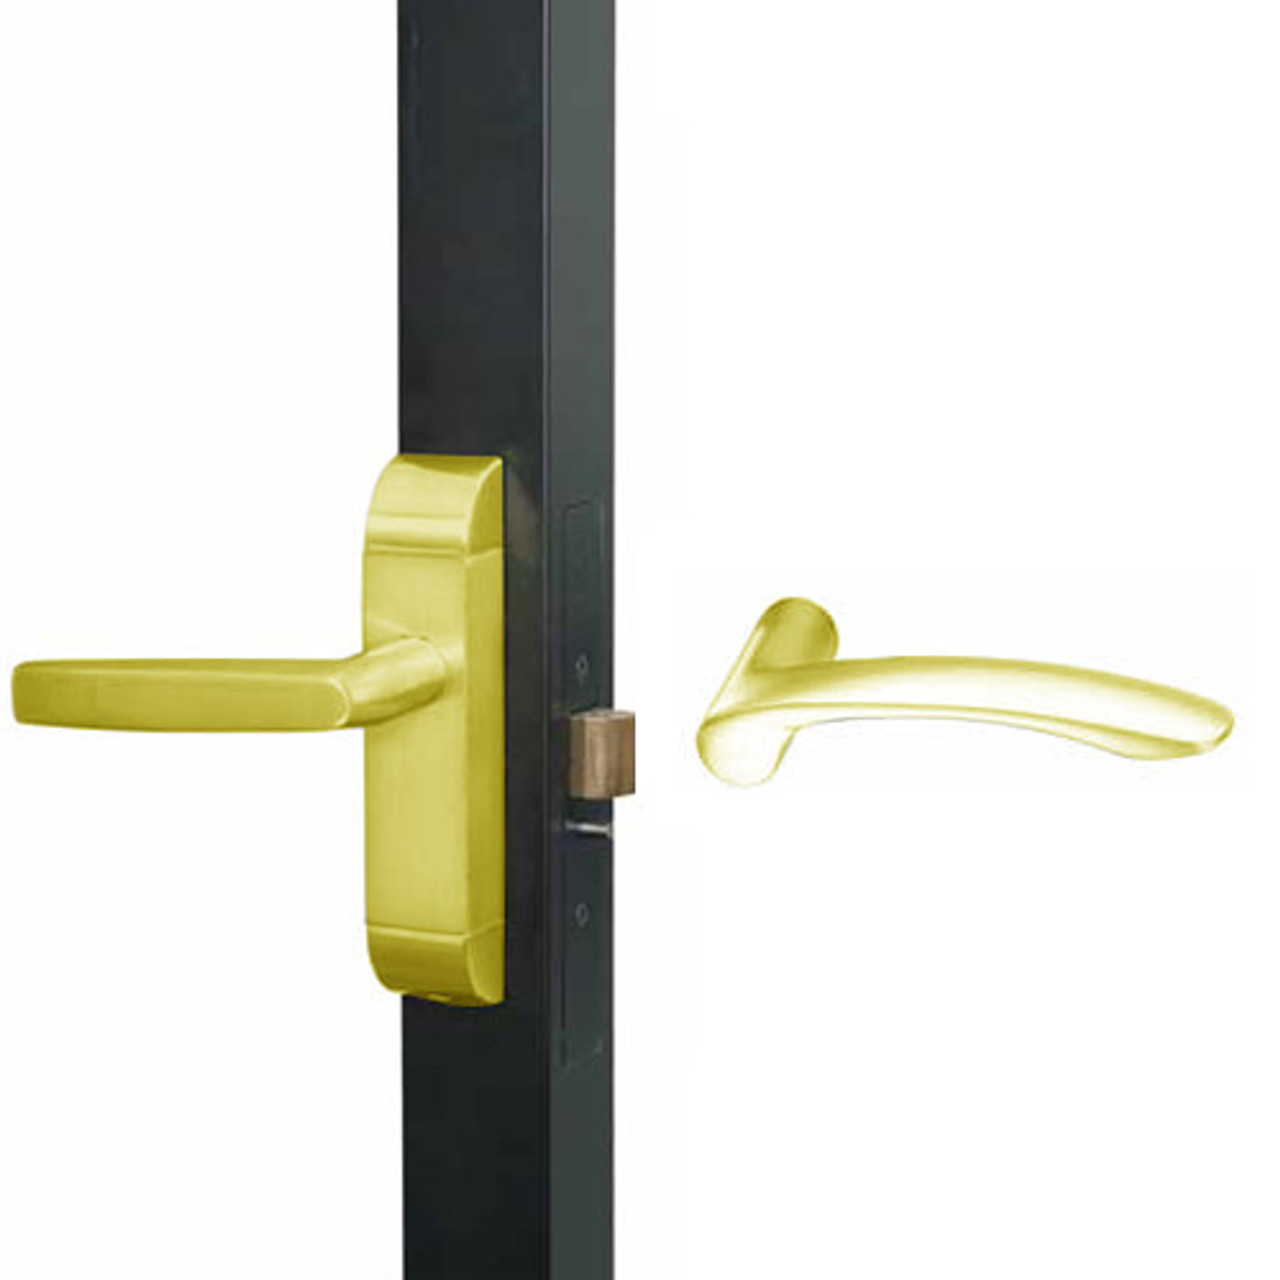 4600-MV-632-US3 Adams Rite MV Designer Deadlatch handle in Bright Brass Finish